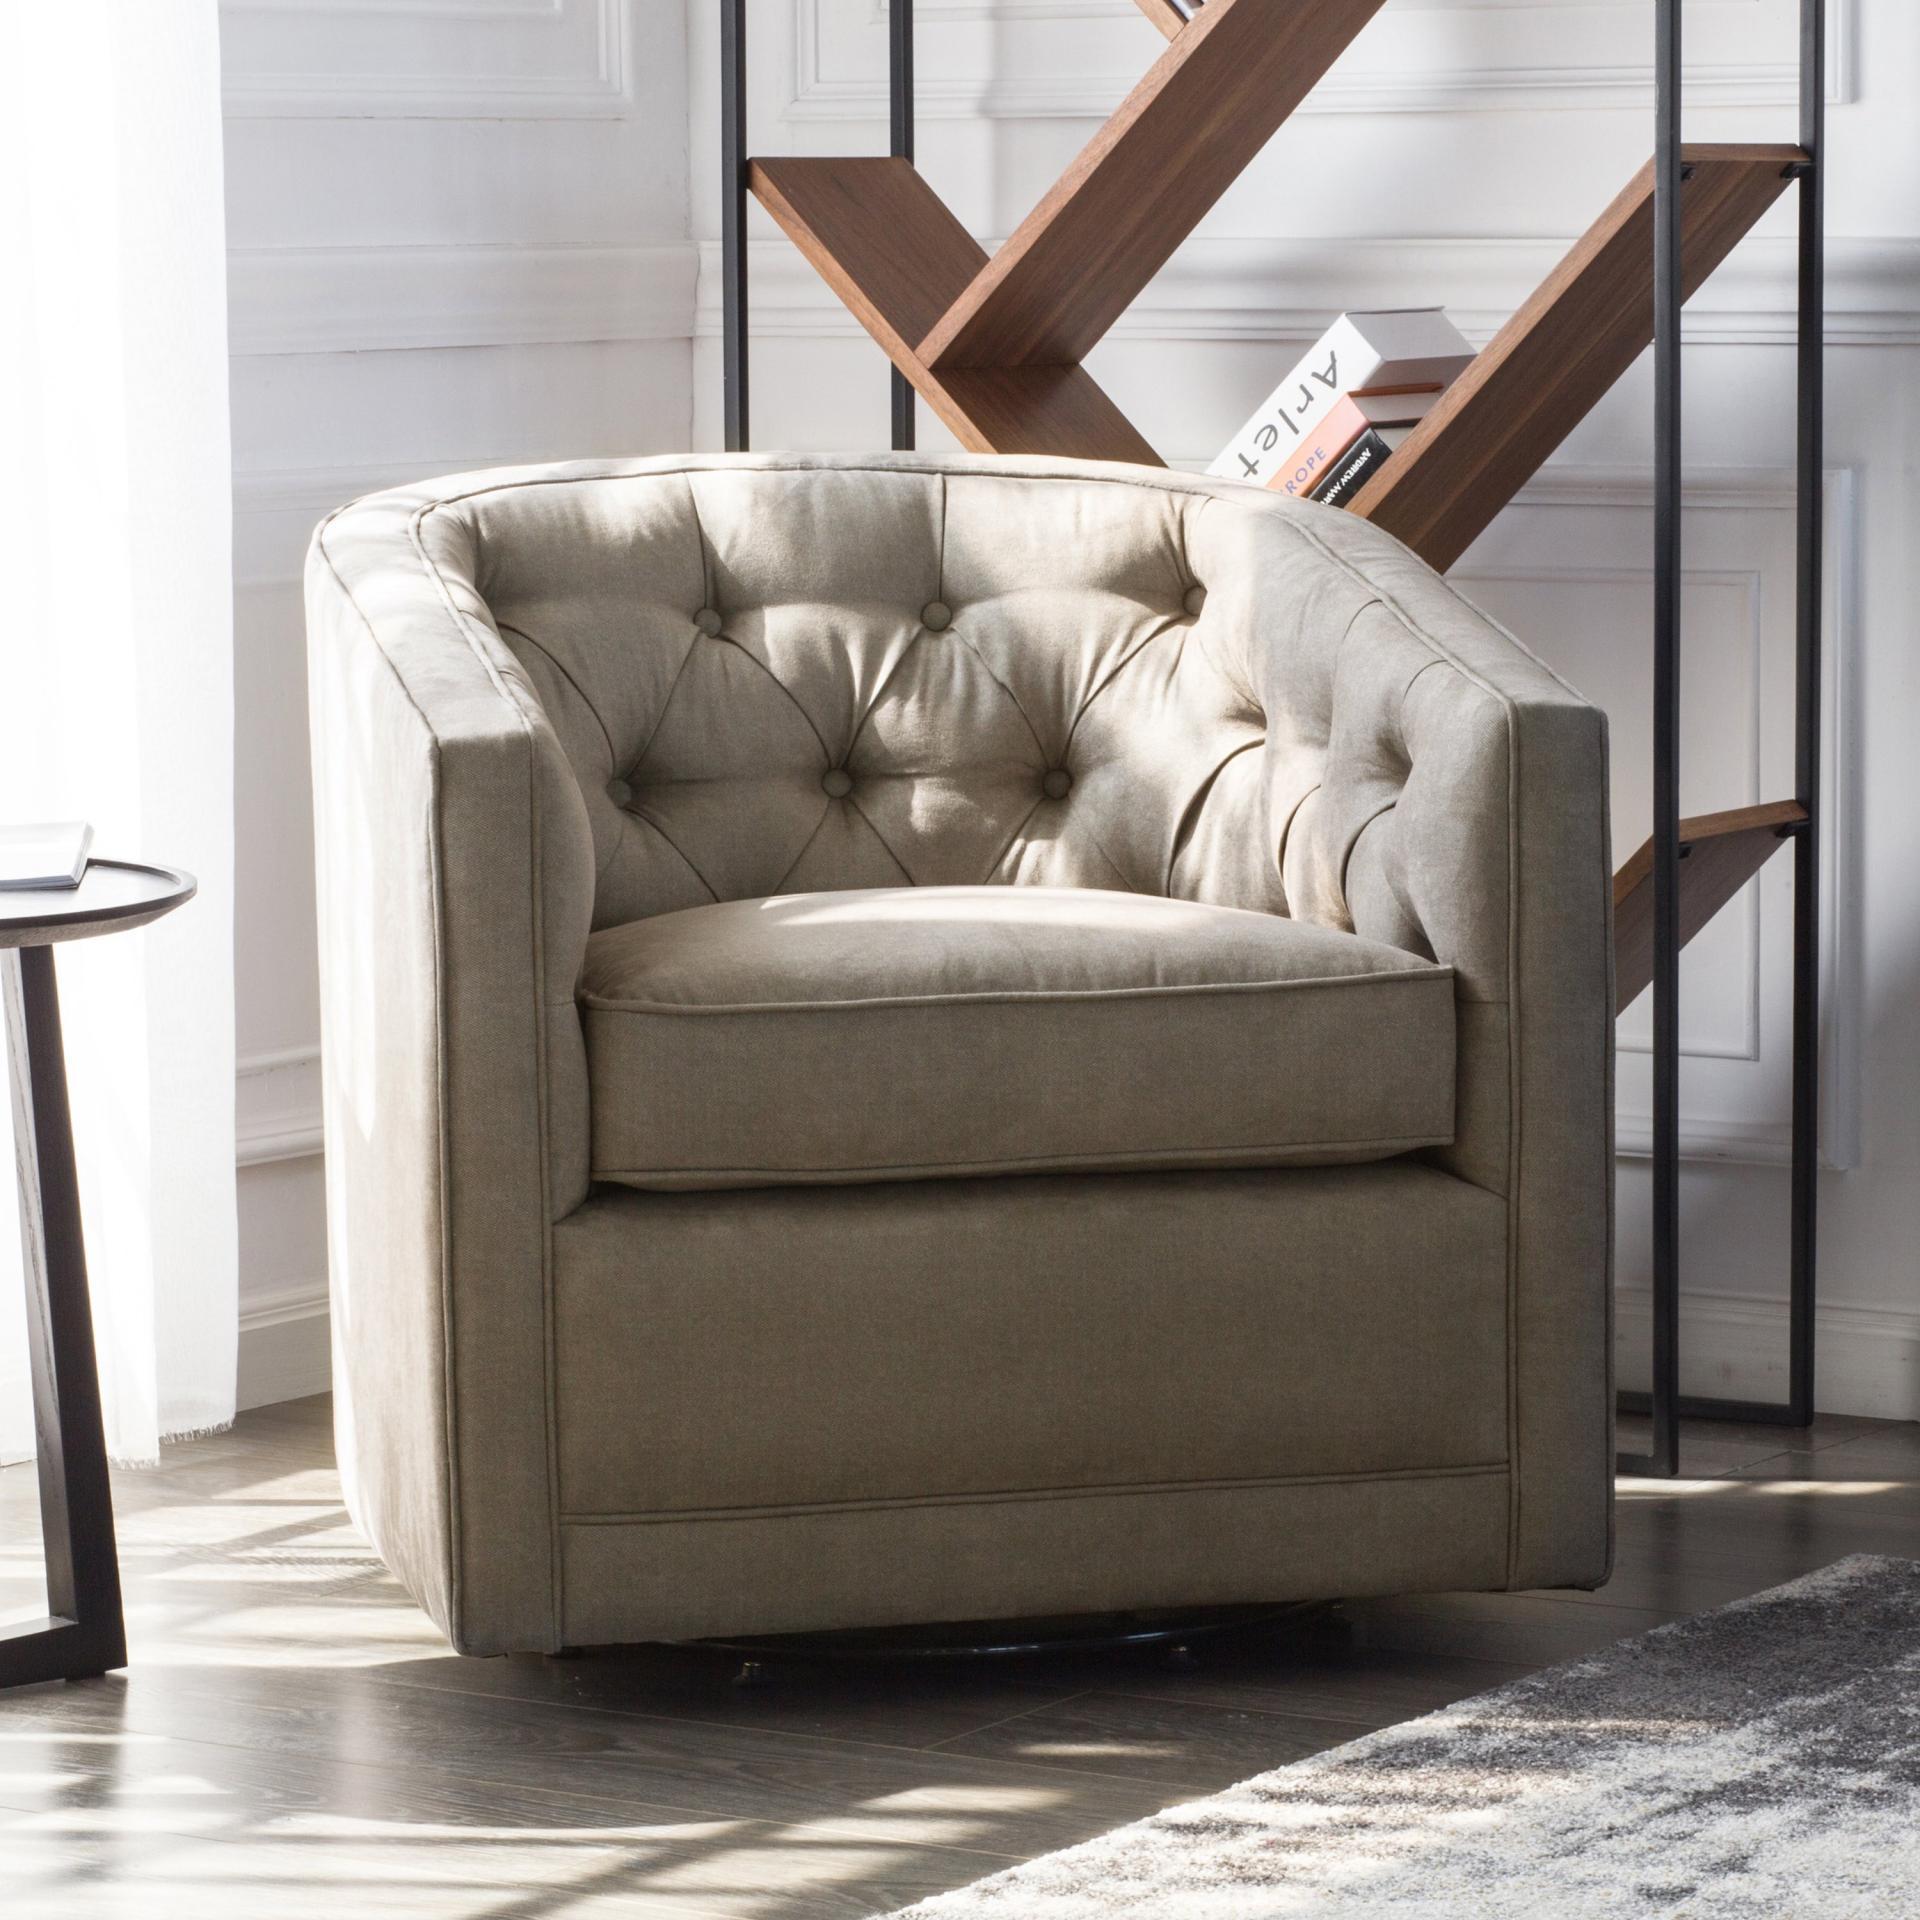 1900101 158 Npd Home Furniture Wholesale Lifestyle